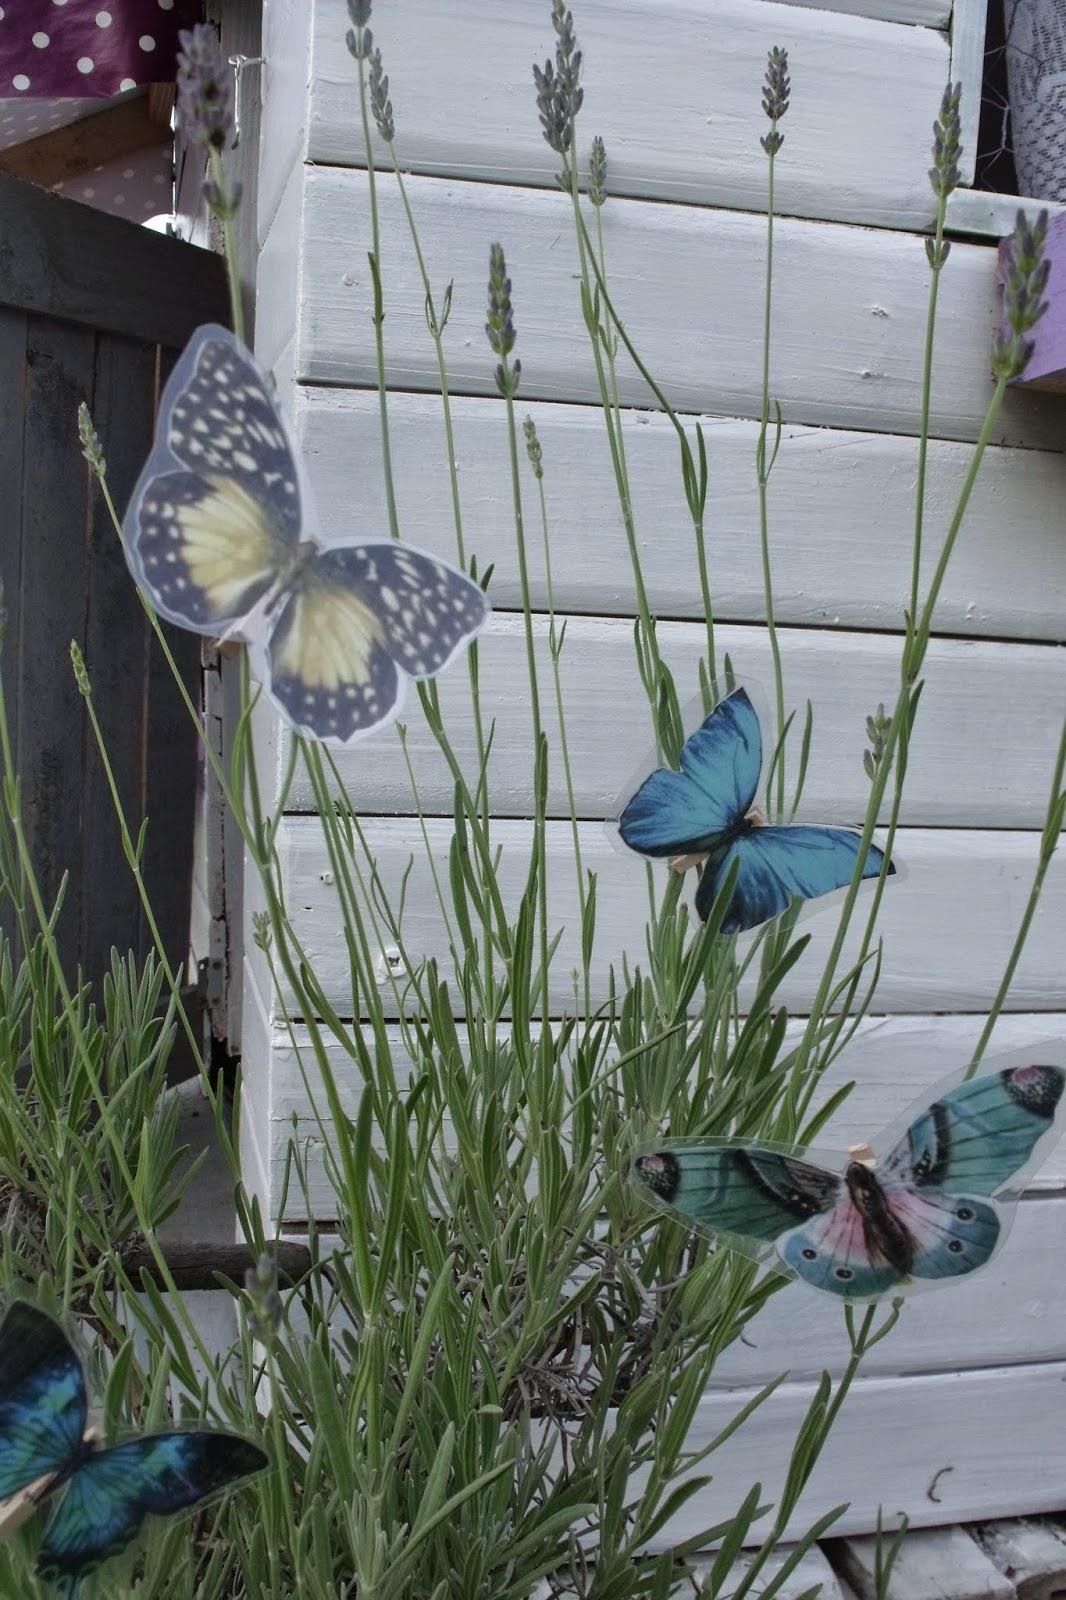 lili joue maman bricole diy deco de jardin papillon partie 1. Black Bedroom Furniture Sets. Home Design Ideas